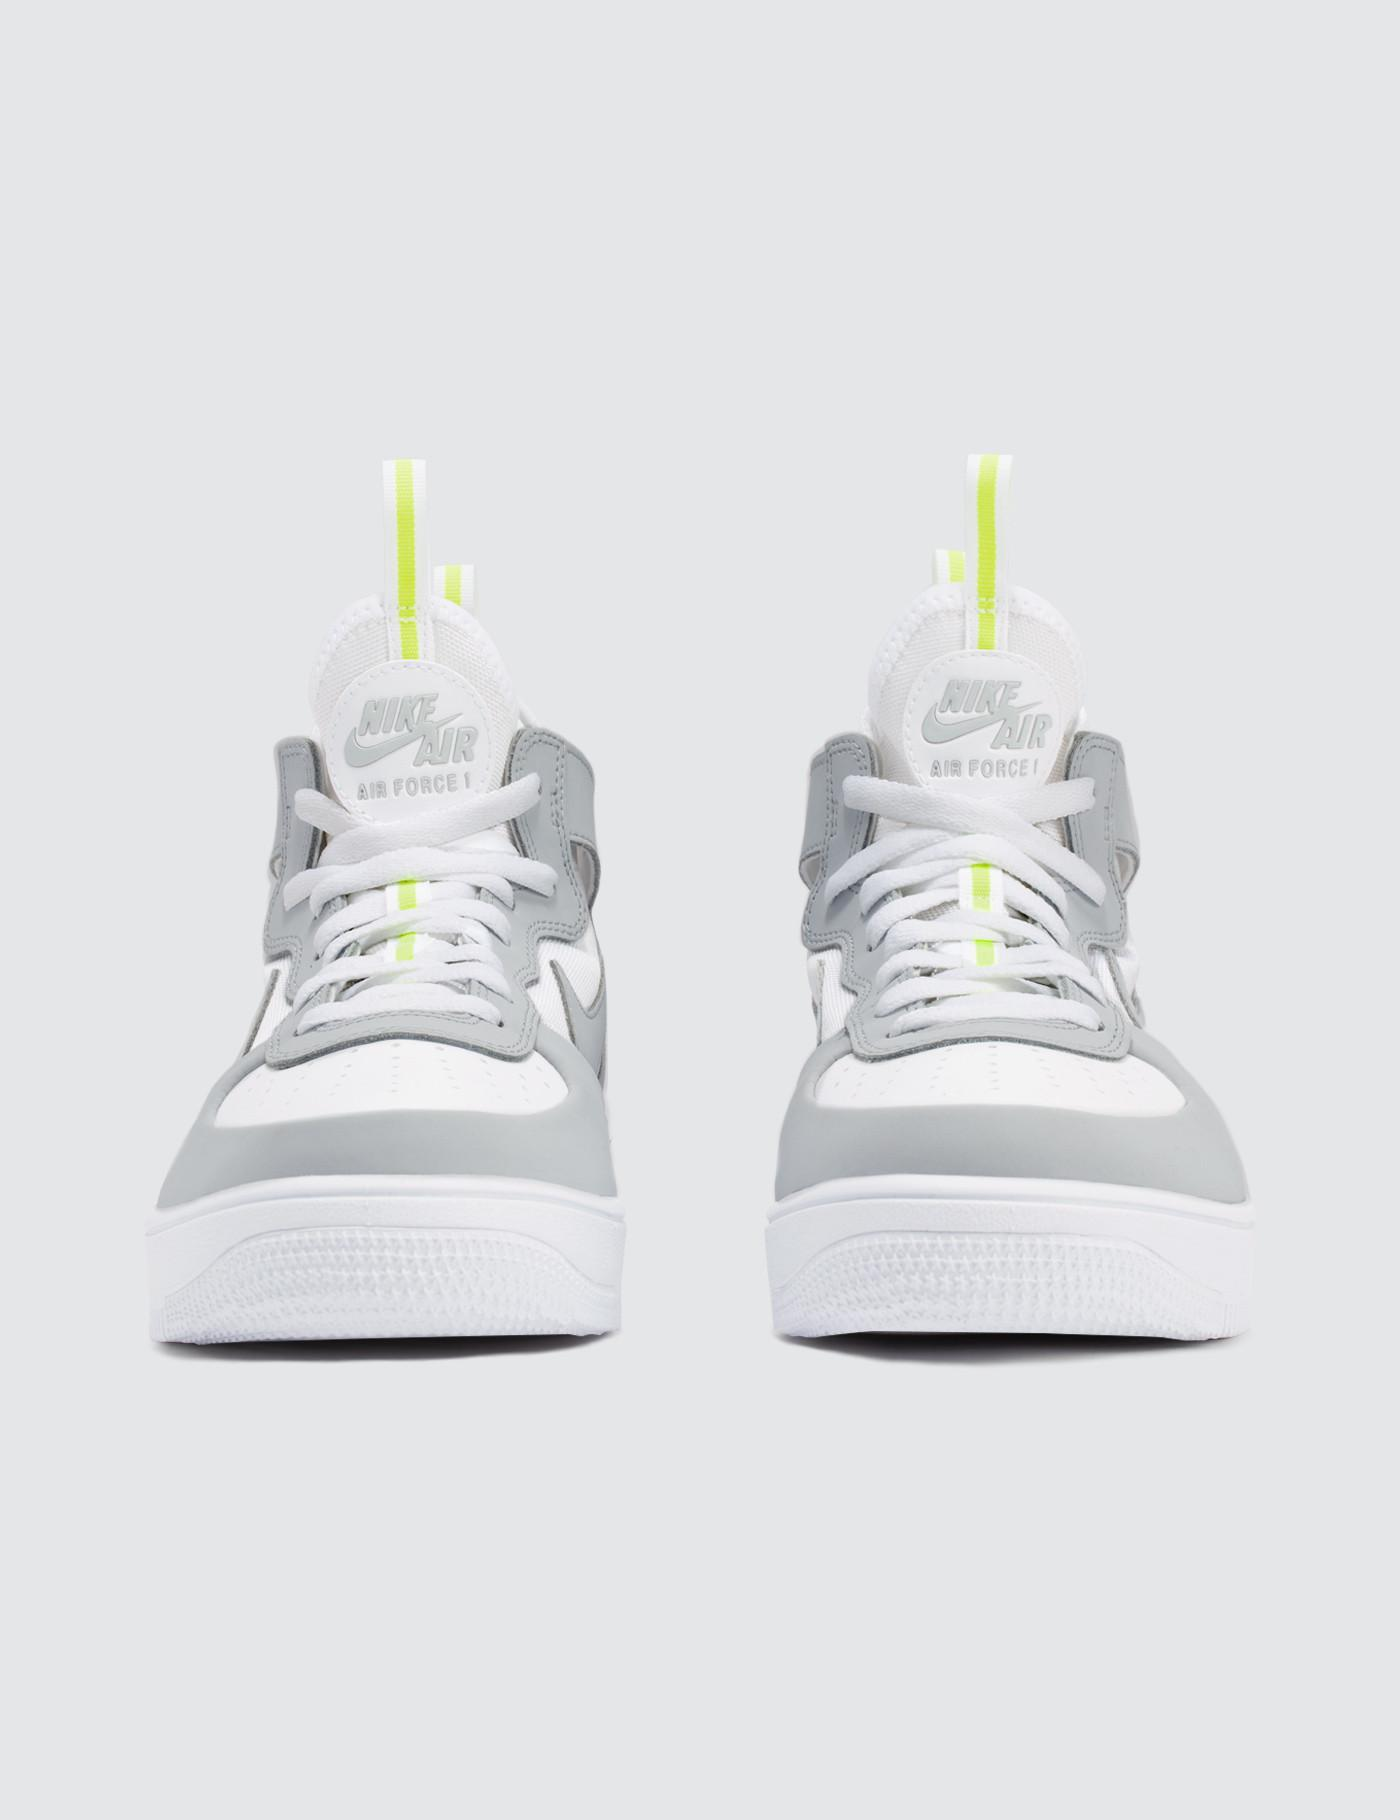 Nike Men White Ultraforce 1 Force For Mid Air LqMGUpzVS